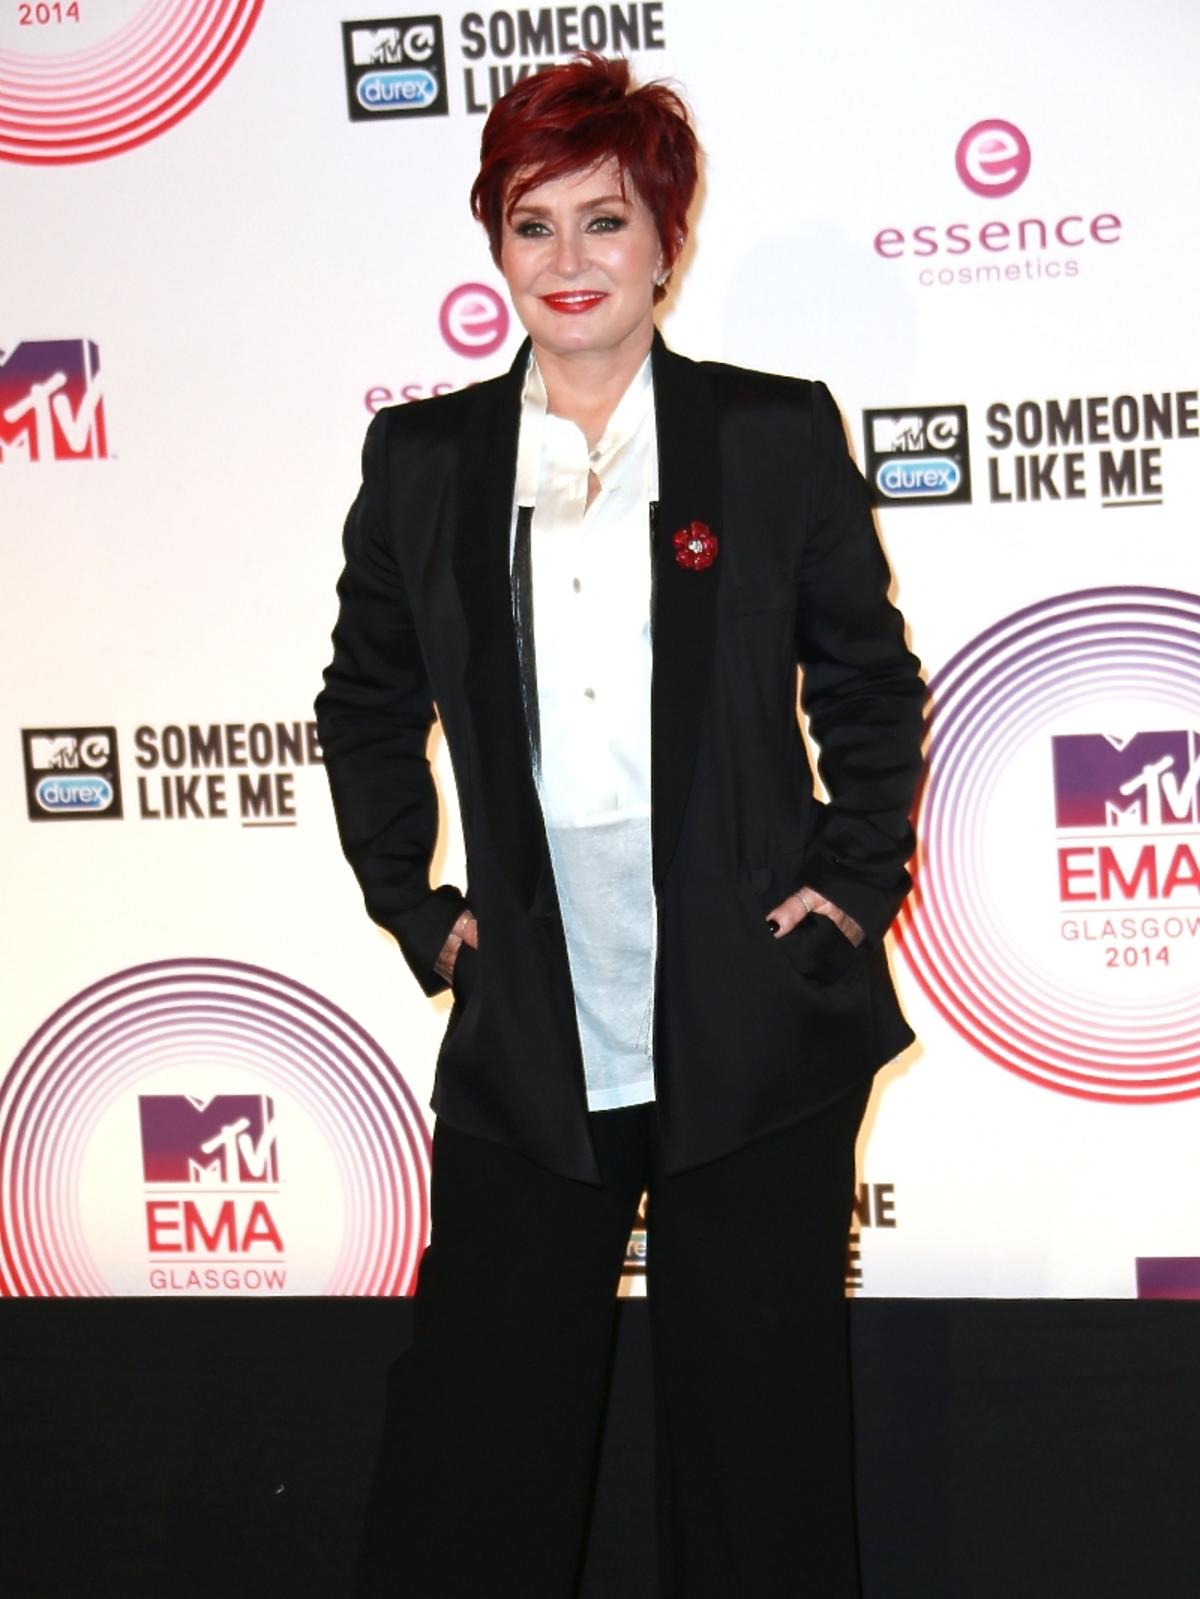 Sharon Osbourne na MTV EMA 2014 w Glasgow